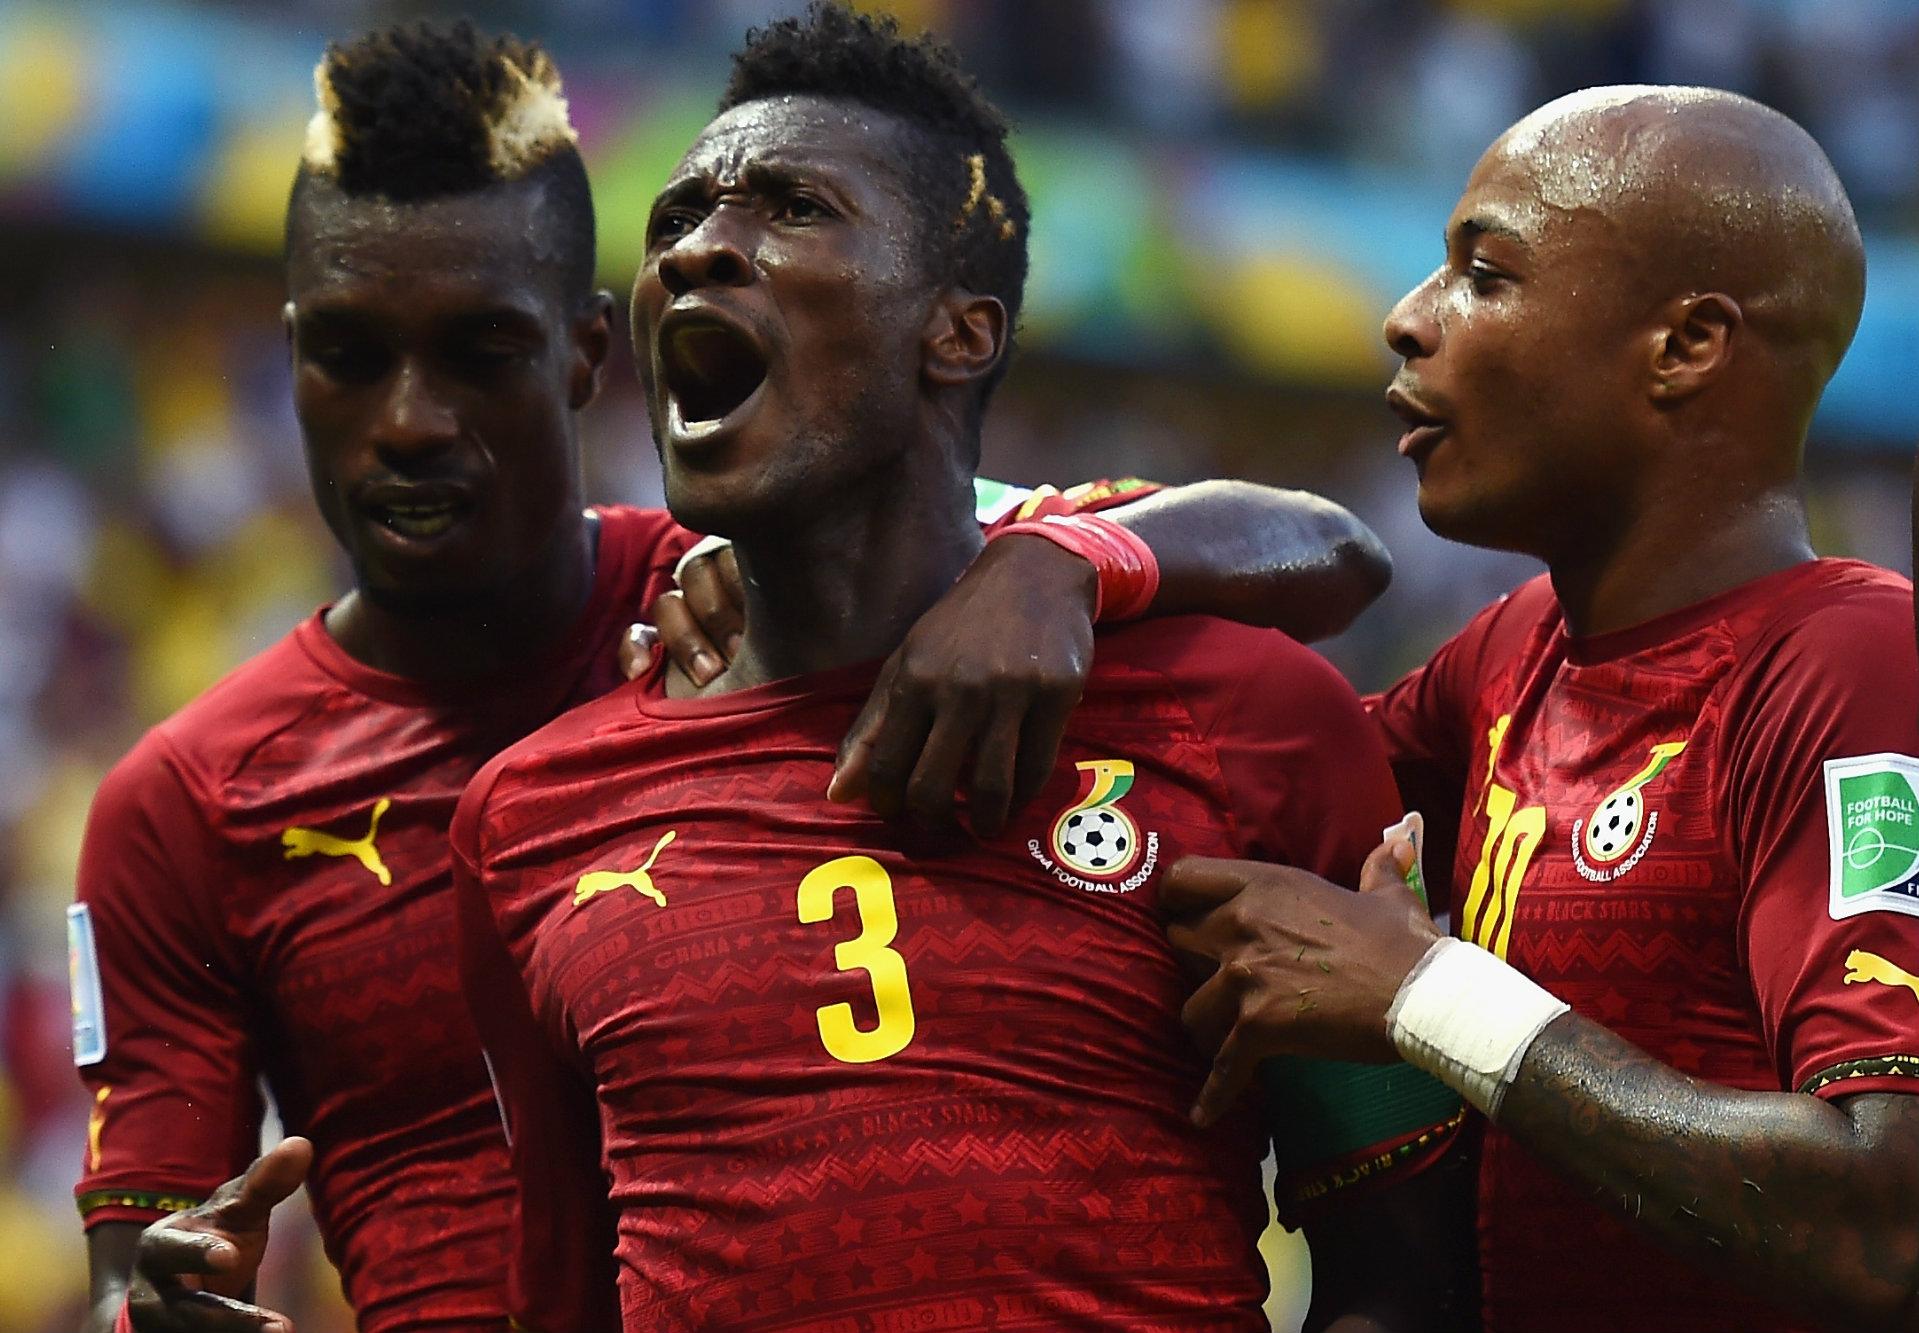 Asamoah Gyan Germany Ghana World Cup 2014 Group G 06212014